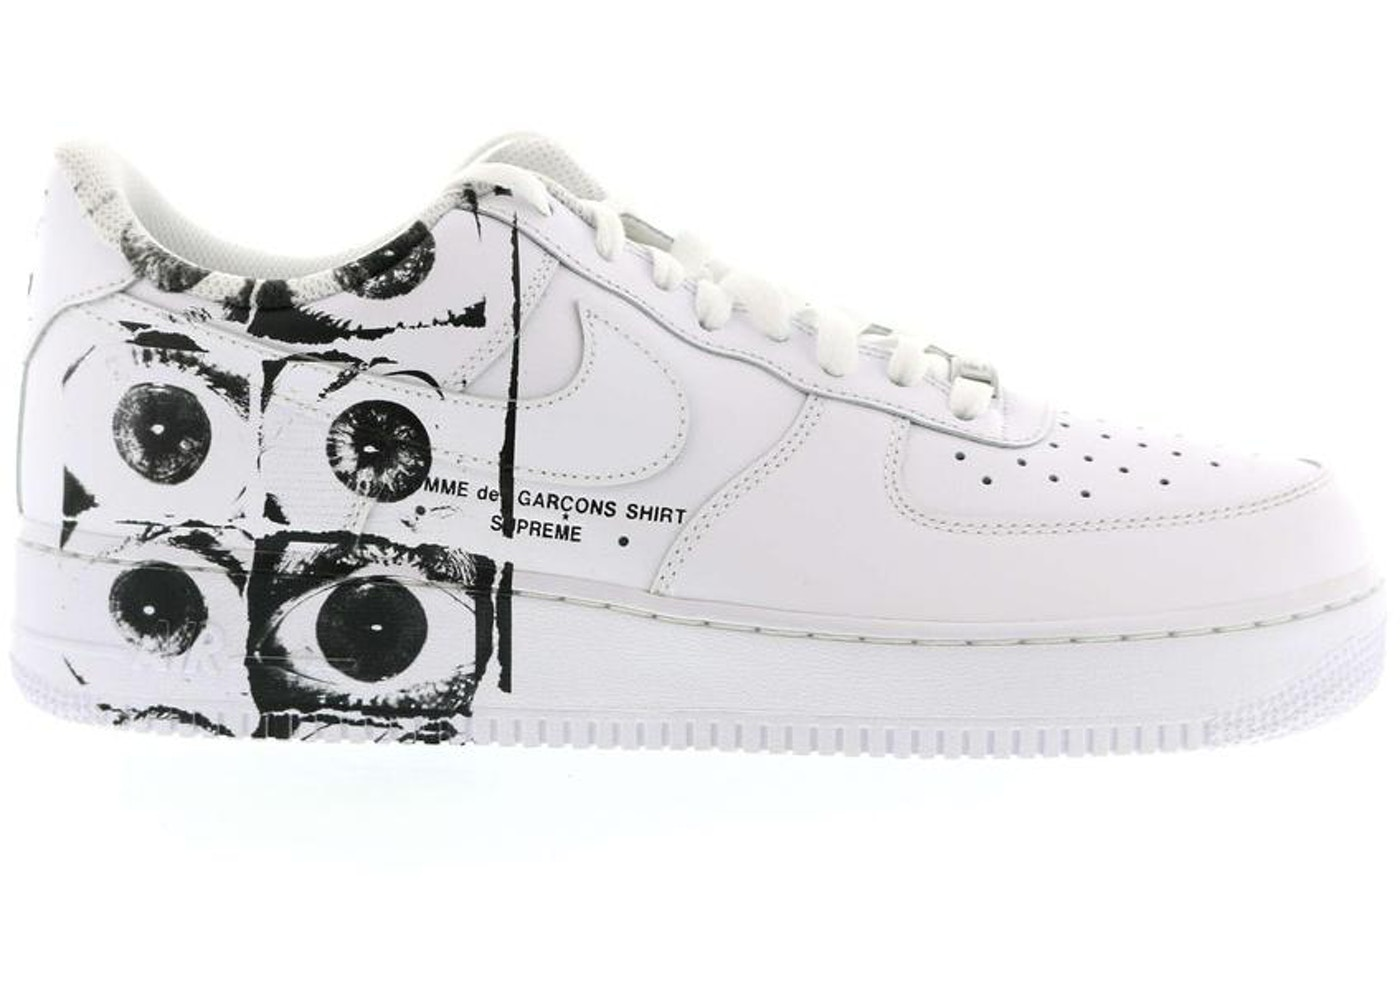 Nike Air Force 1 Low Supreme Comme Des